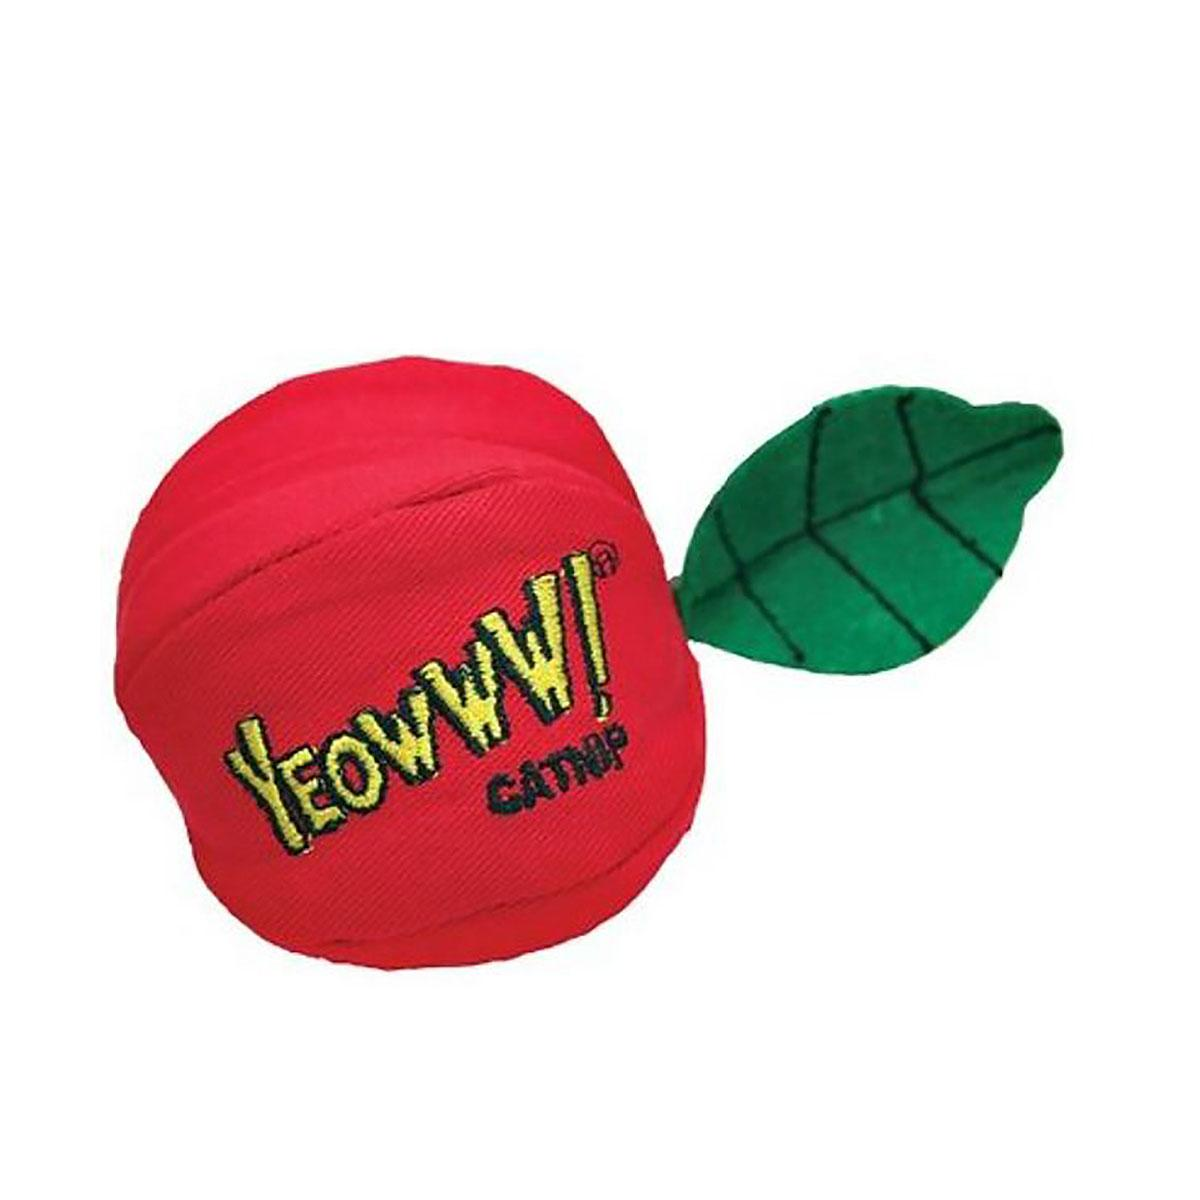 Yeowww! Catnip Cat Toy - Red Apple